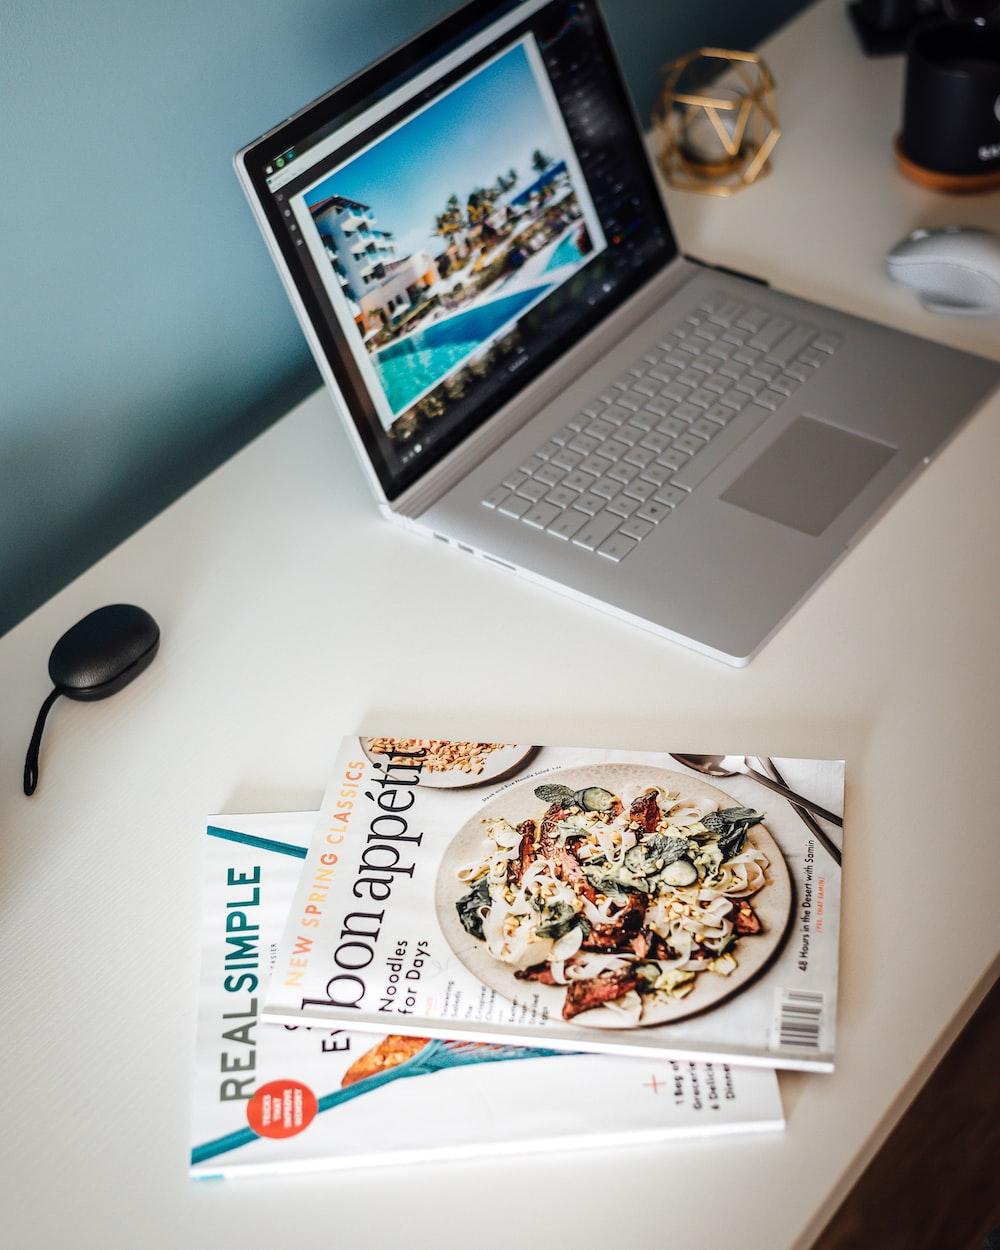 MacBook Pro beside magazines